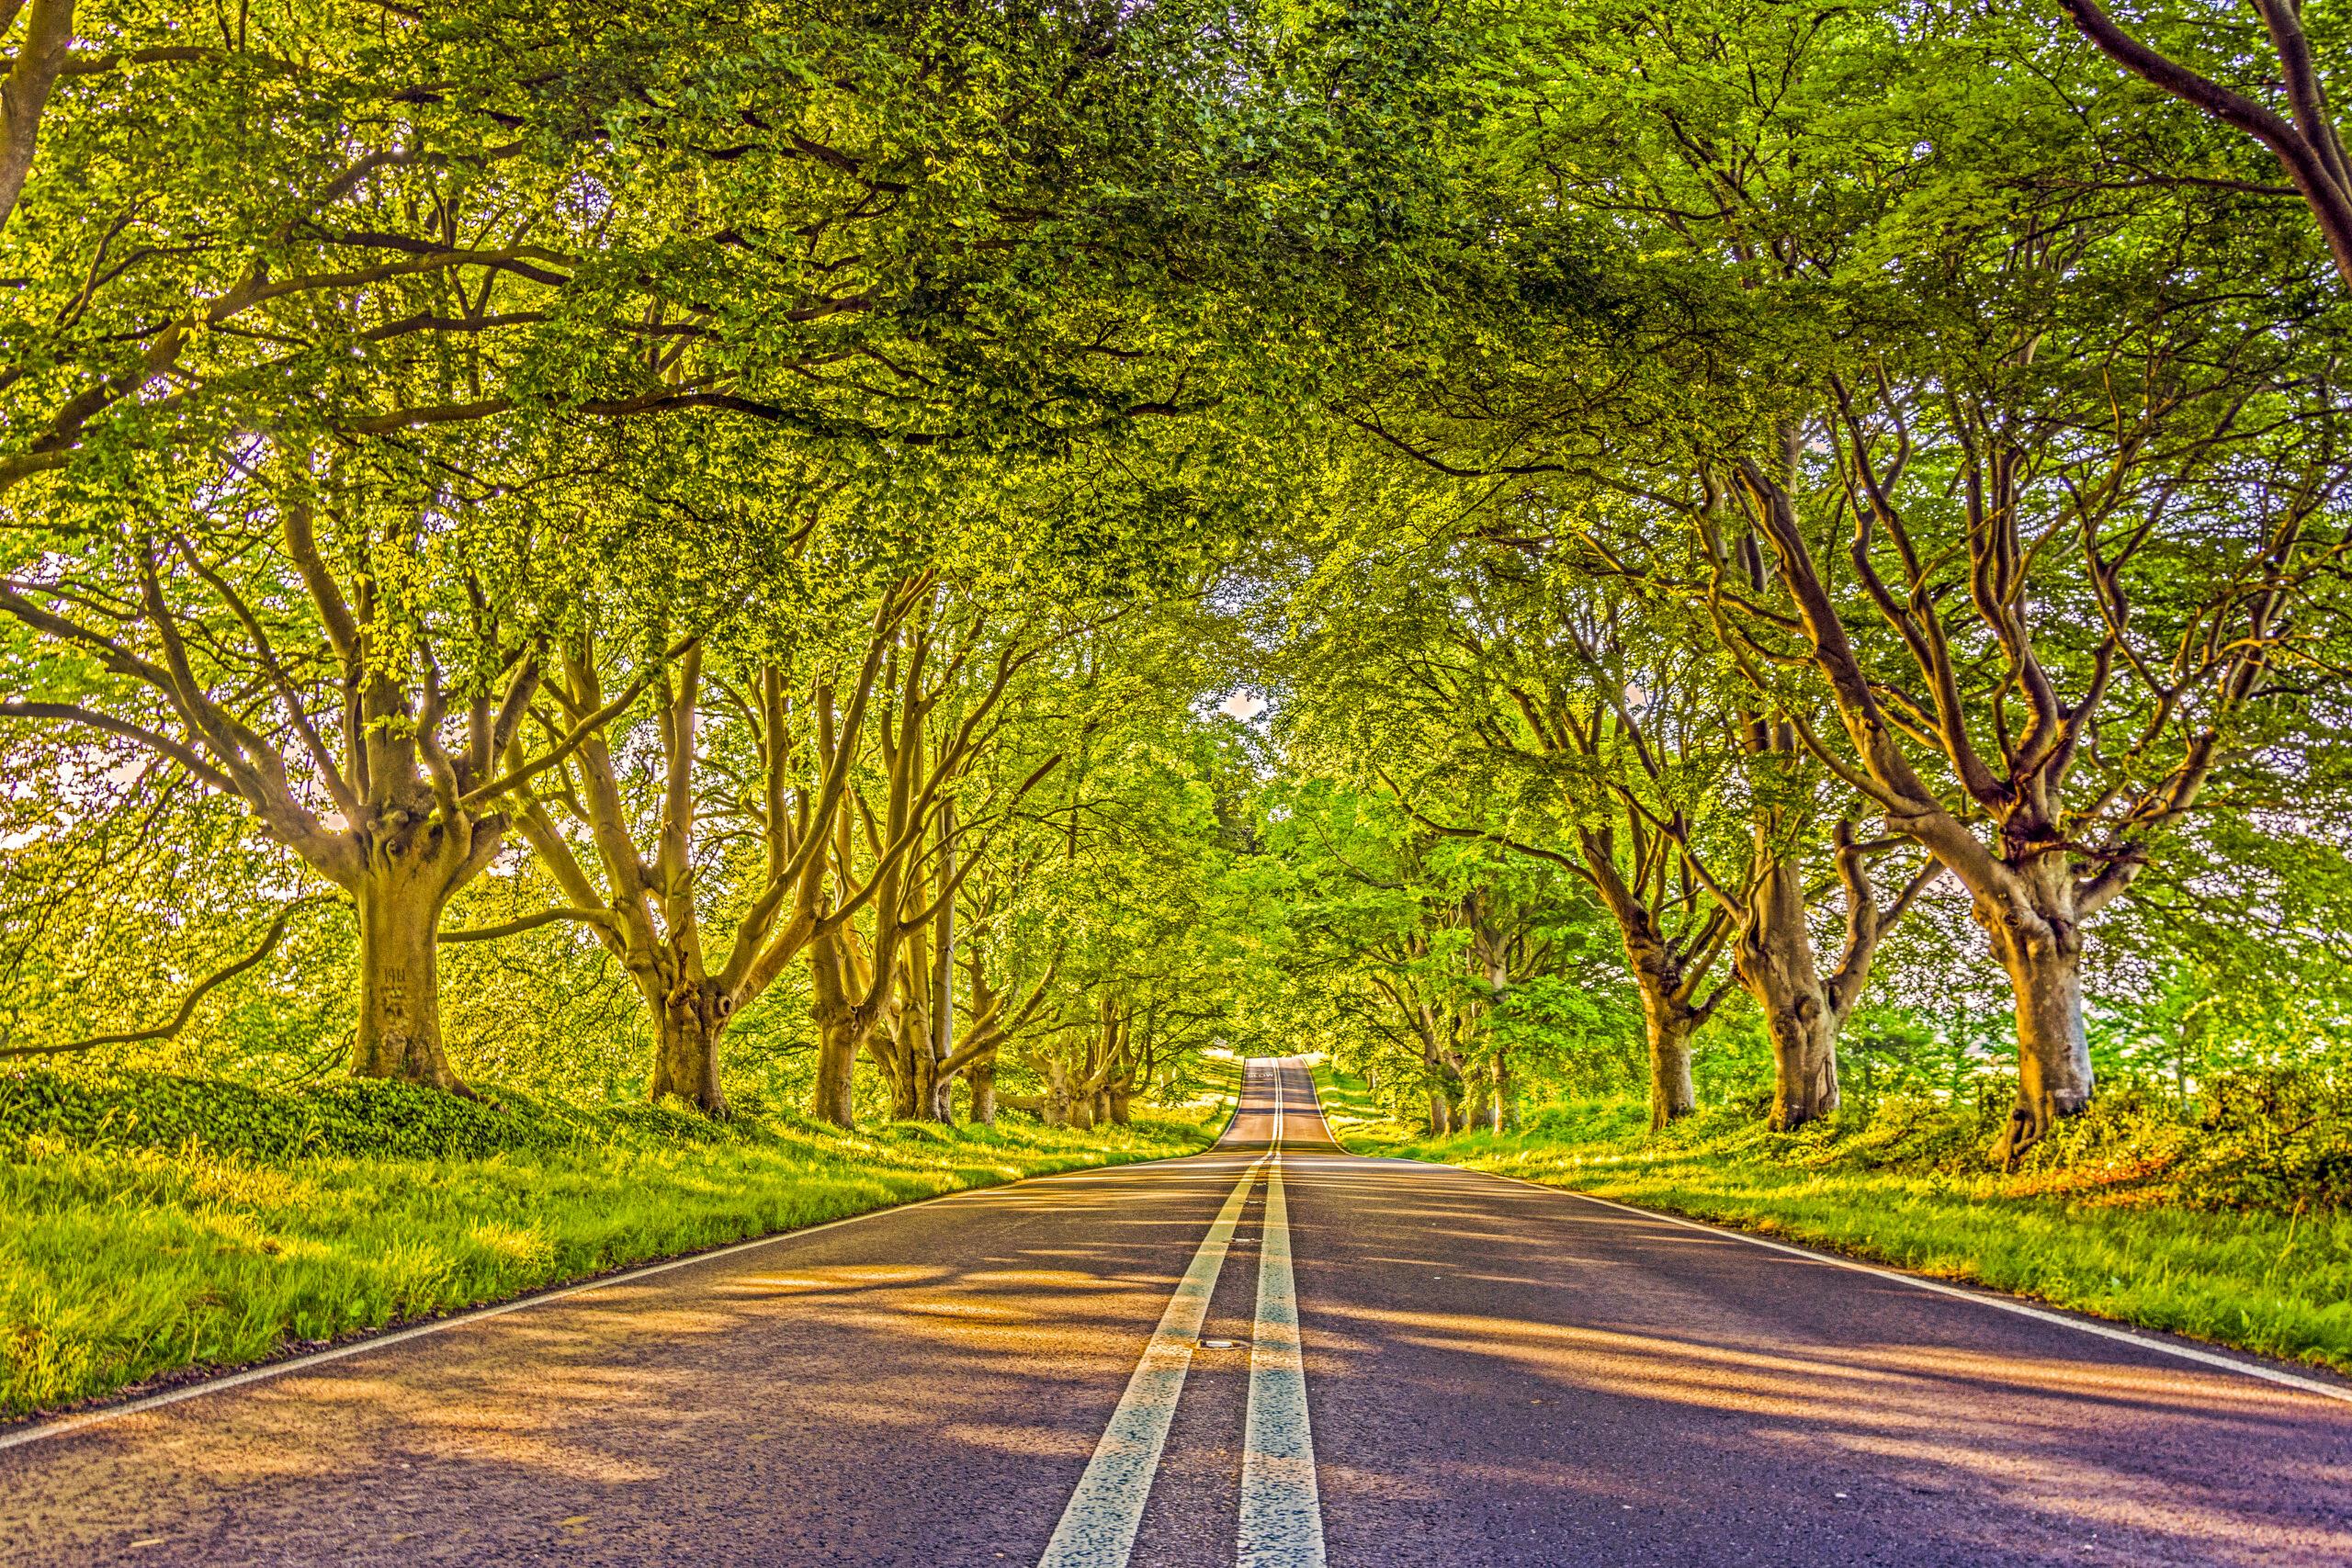 Badbury Rings Avenue, Wimborne Minster, Dorset   Badbury Rings